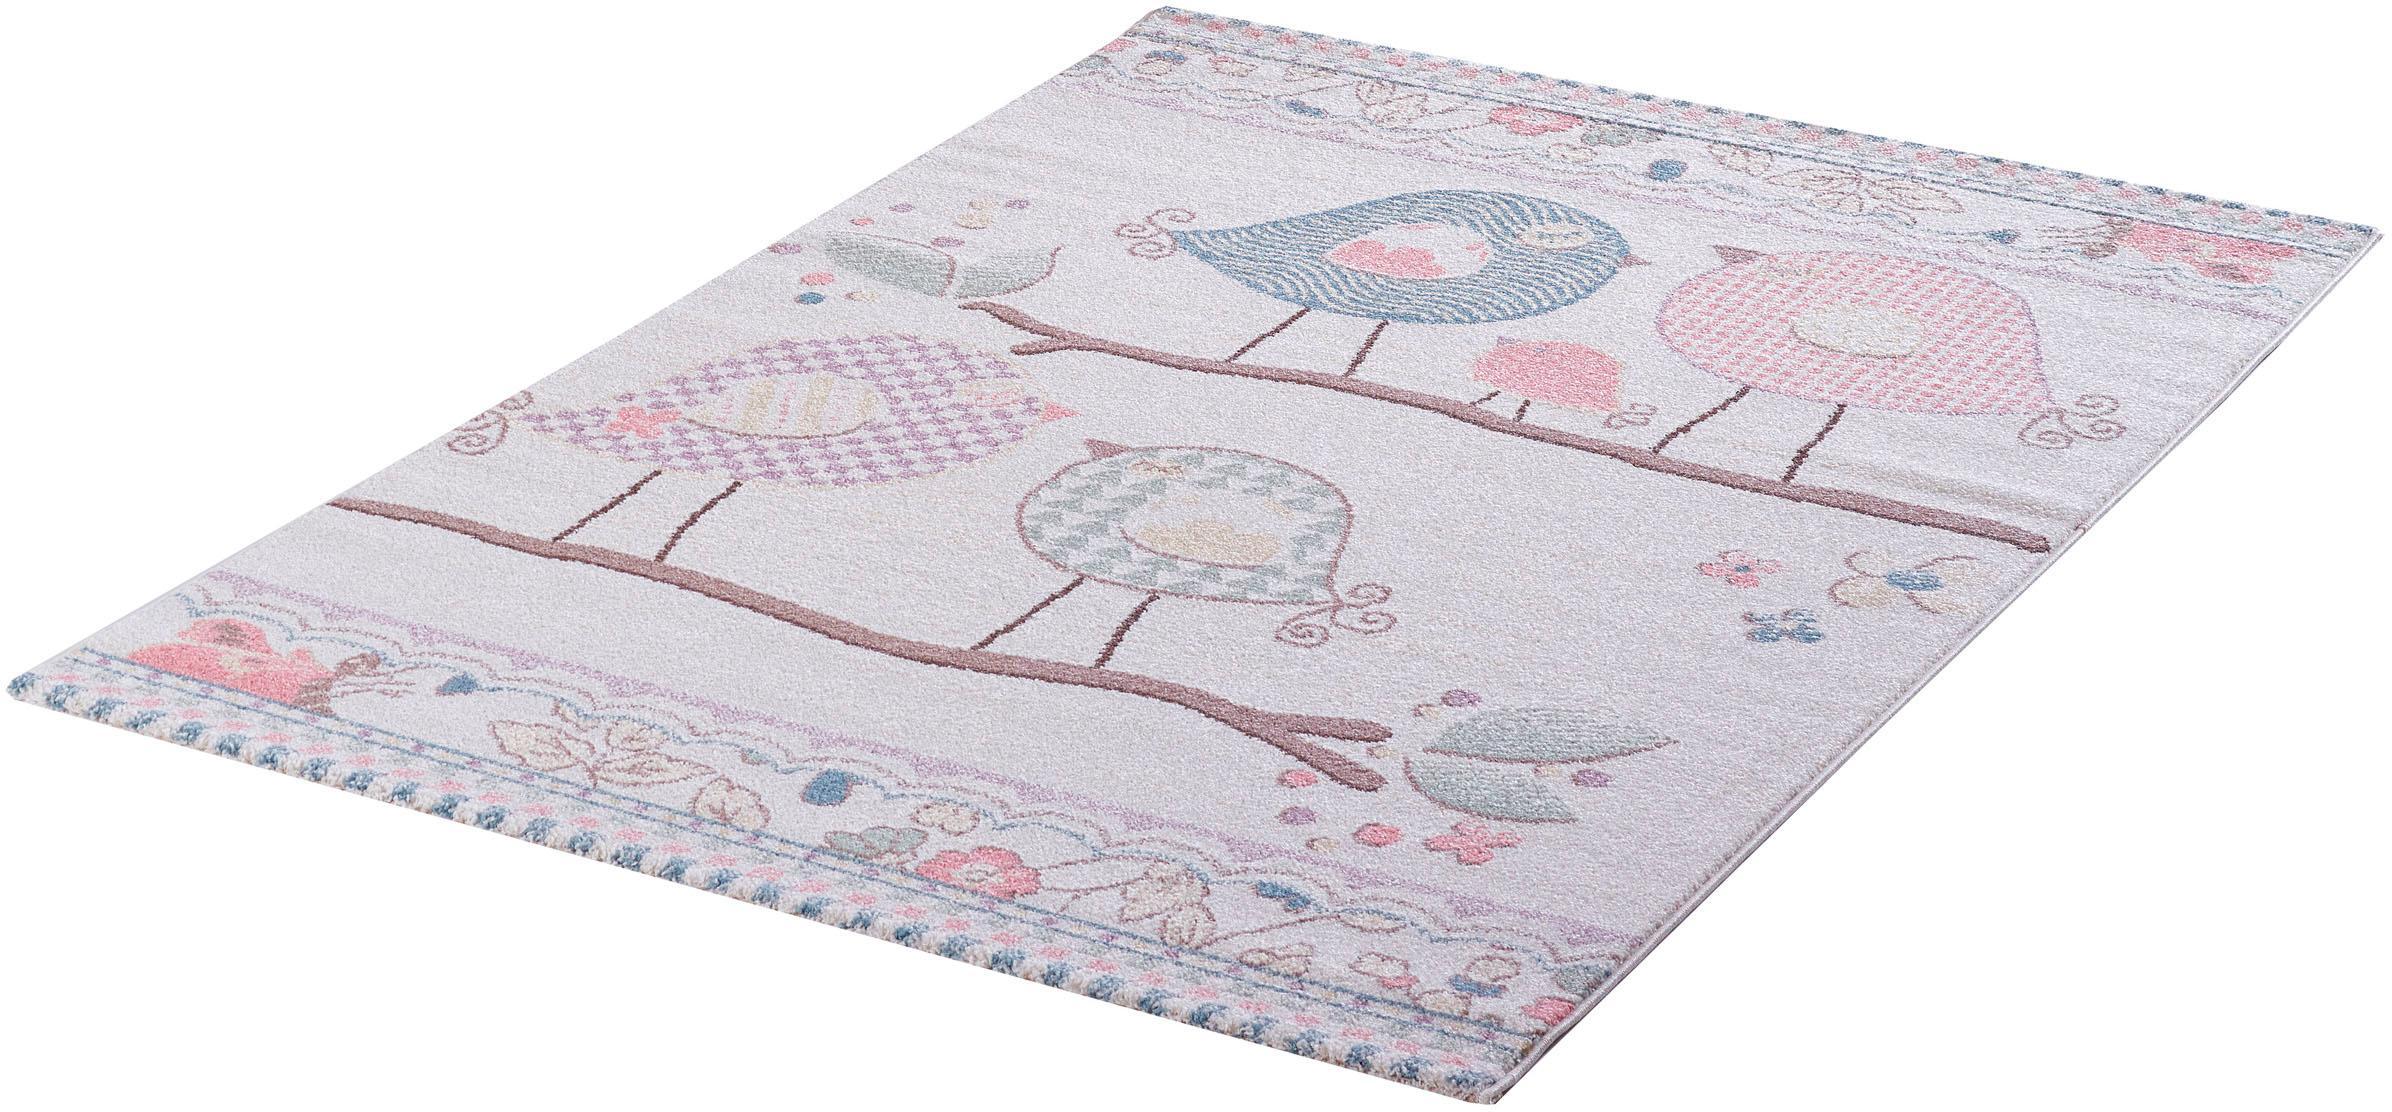 Kinderteppich Luna Kids 4606 Sanat Teppiche rechteckig Höhe 12 mm maschinell gewebt